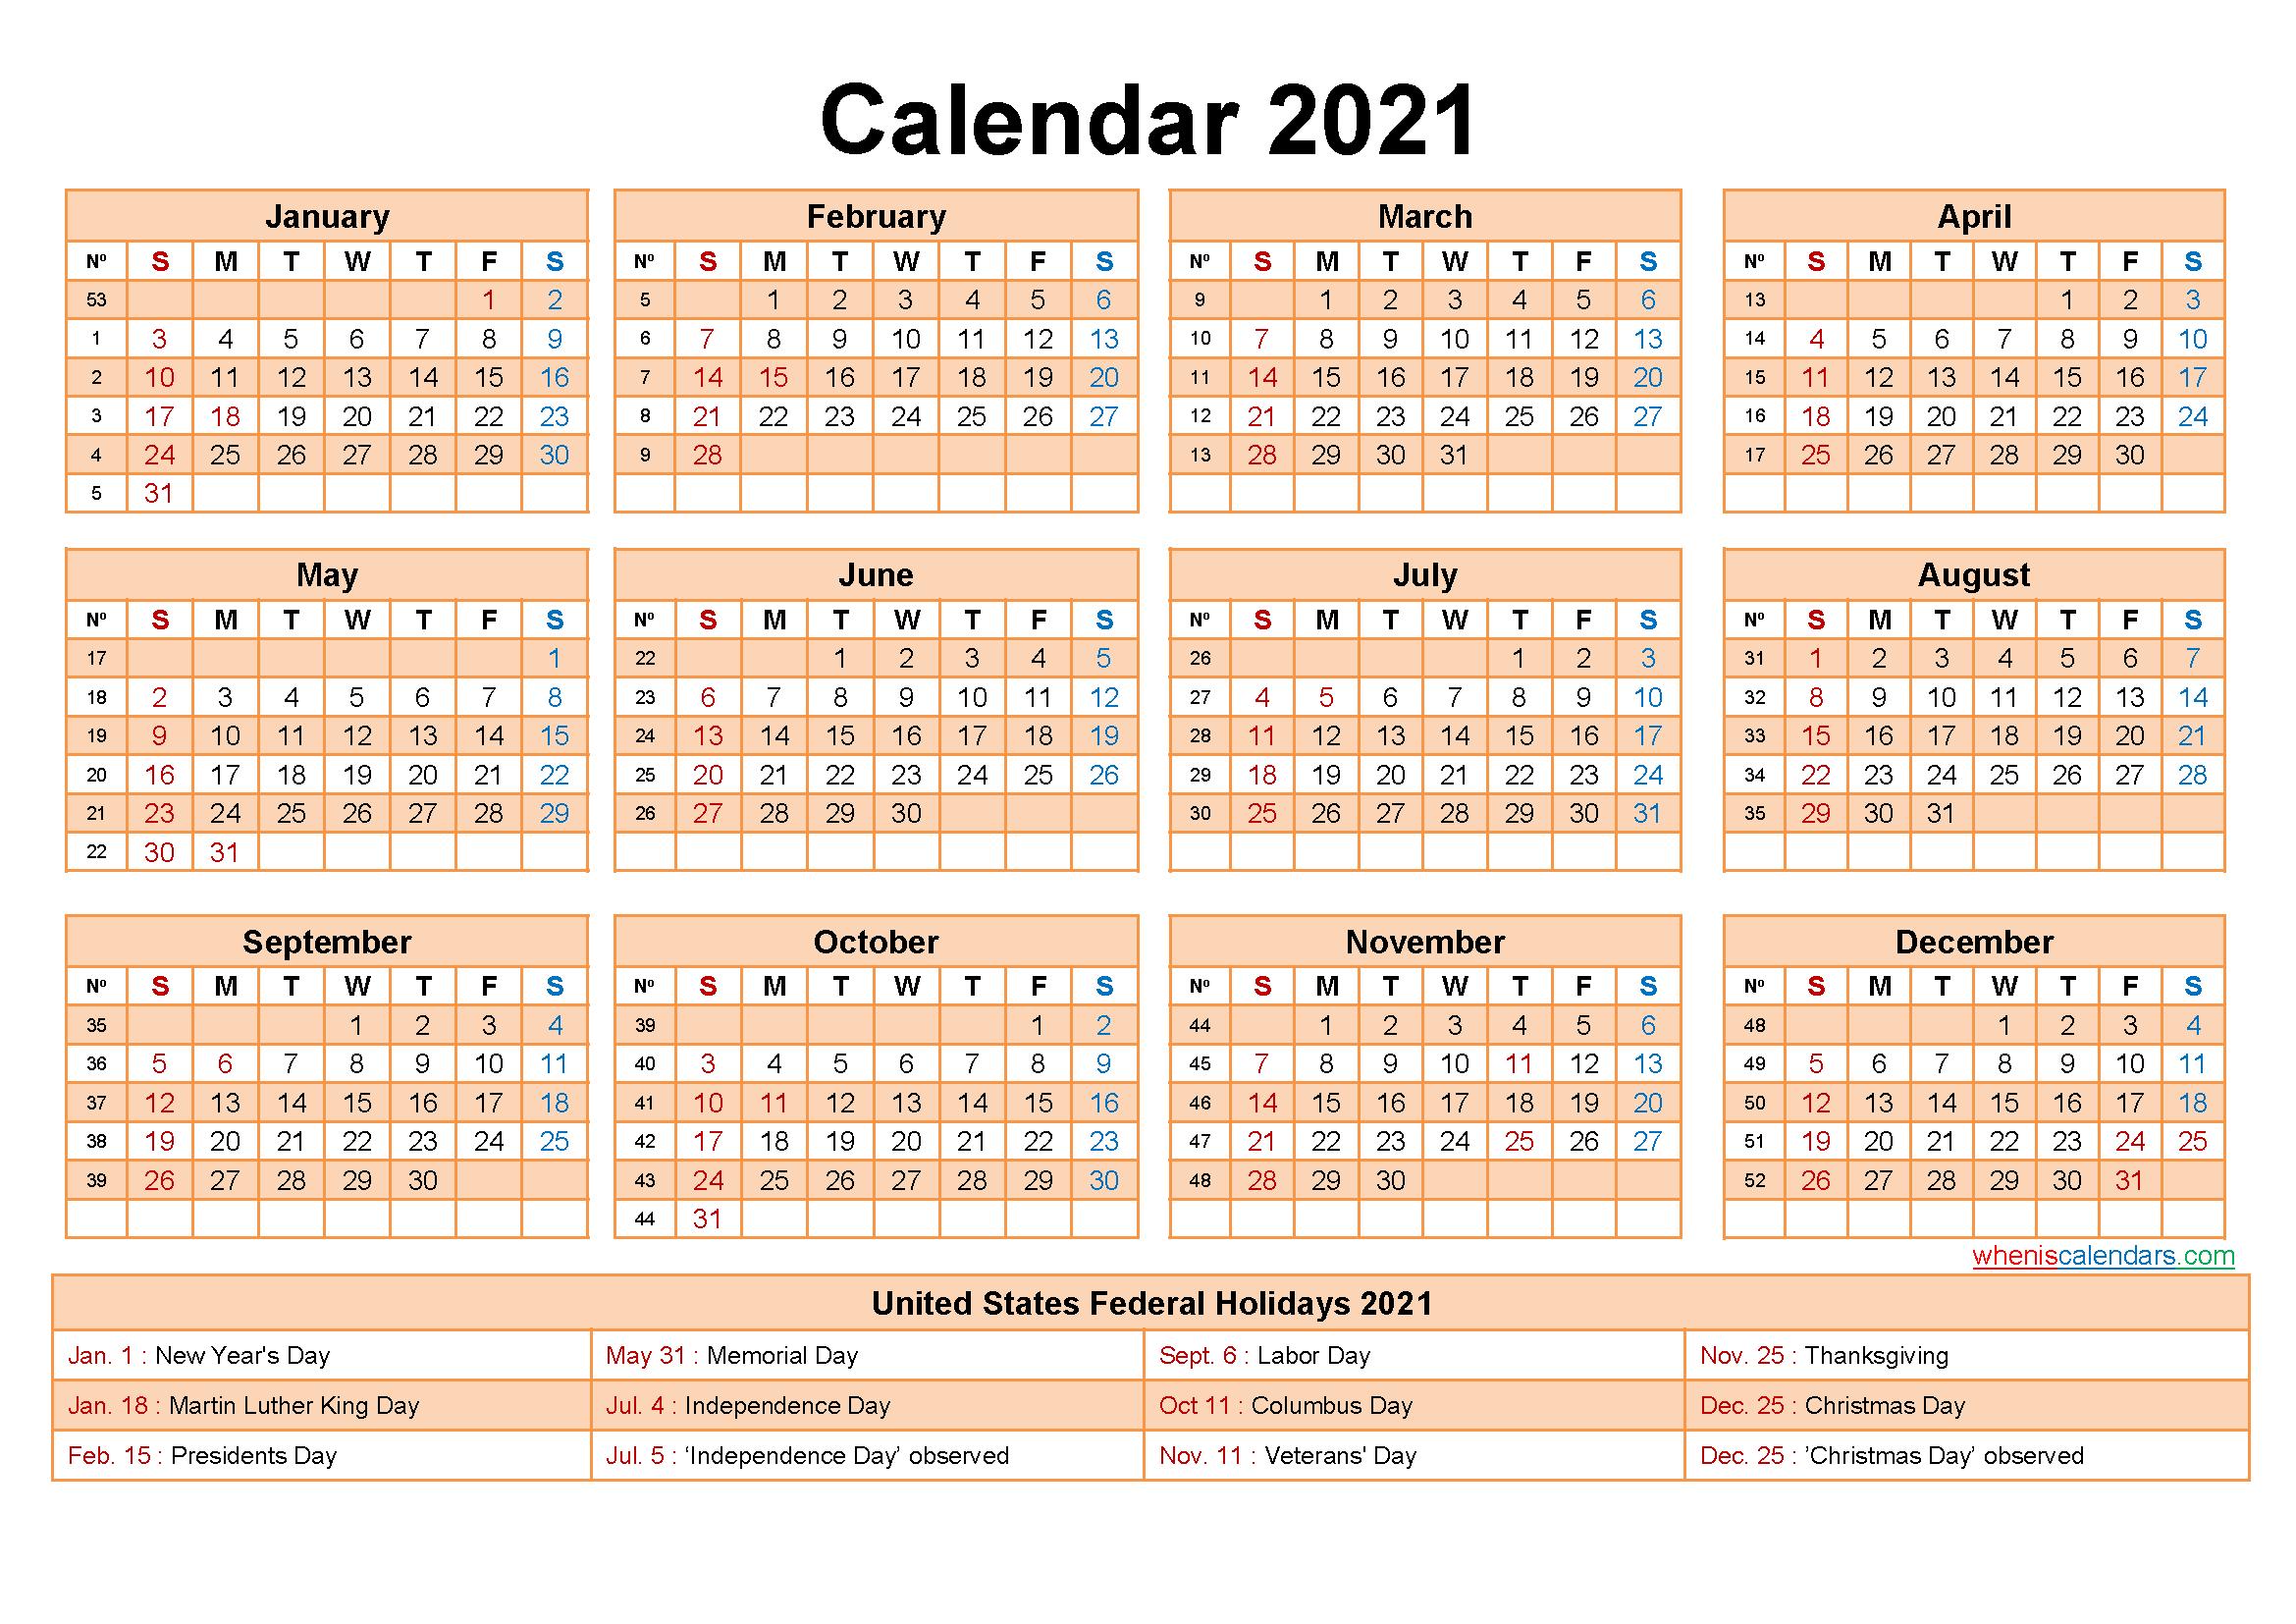 22x17 Desk Calendar 2021 with Holidays